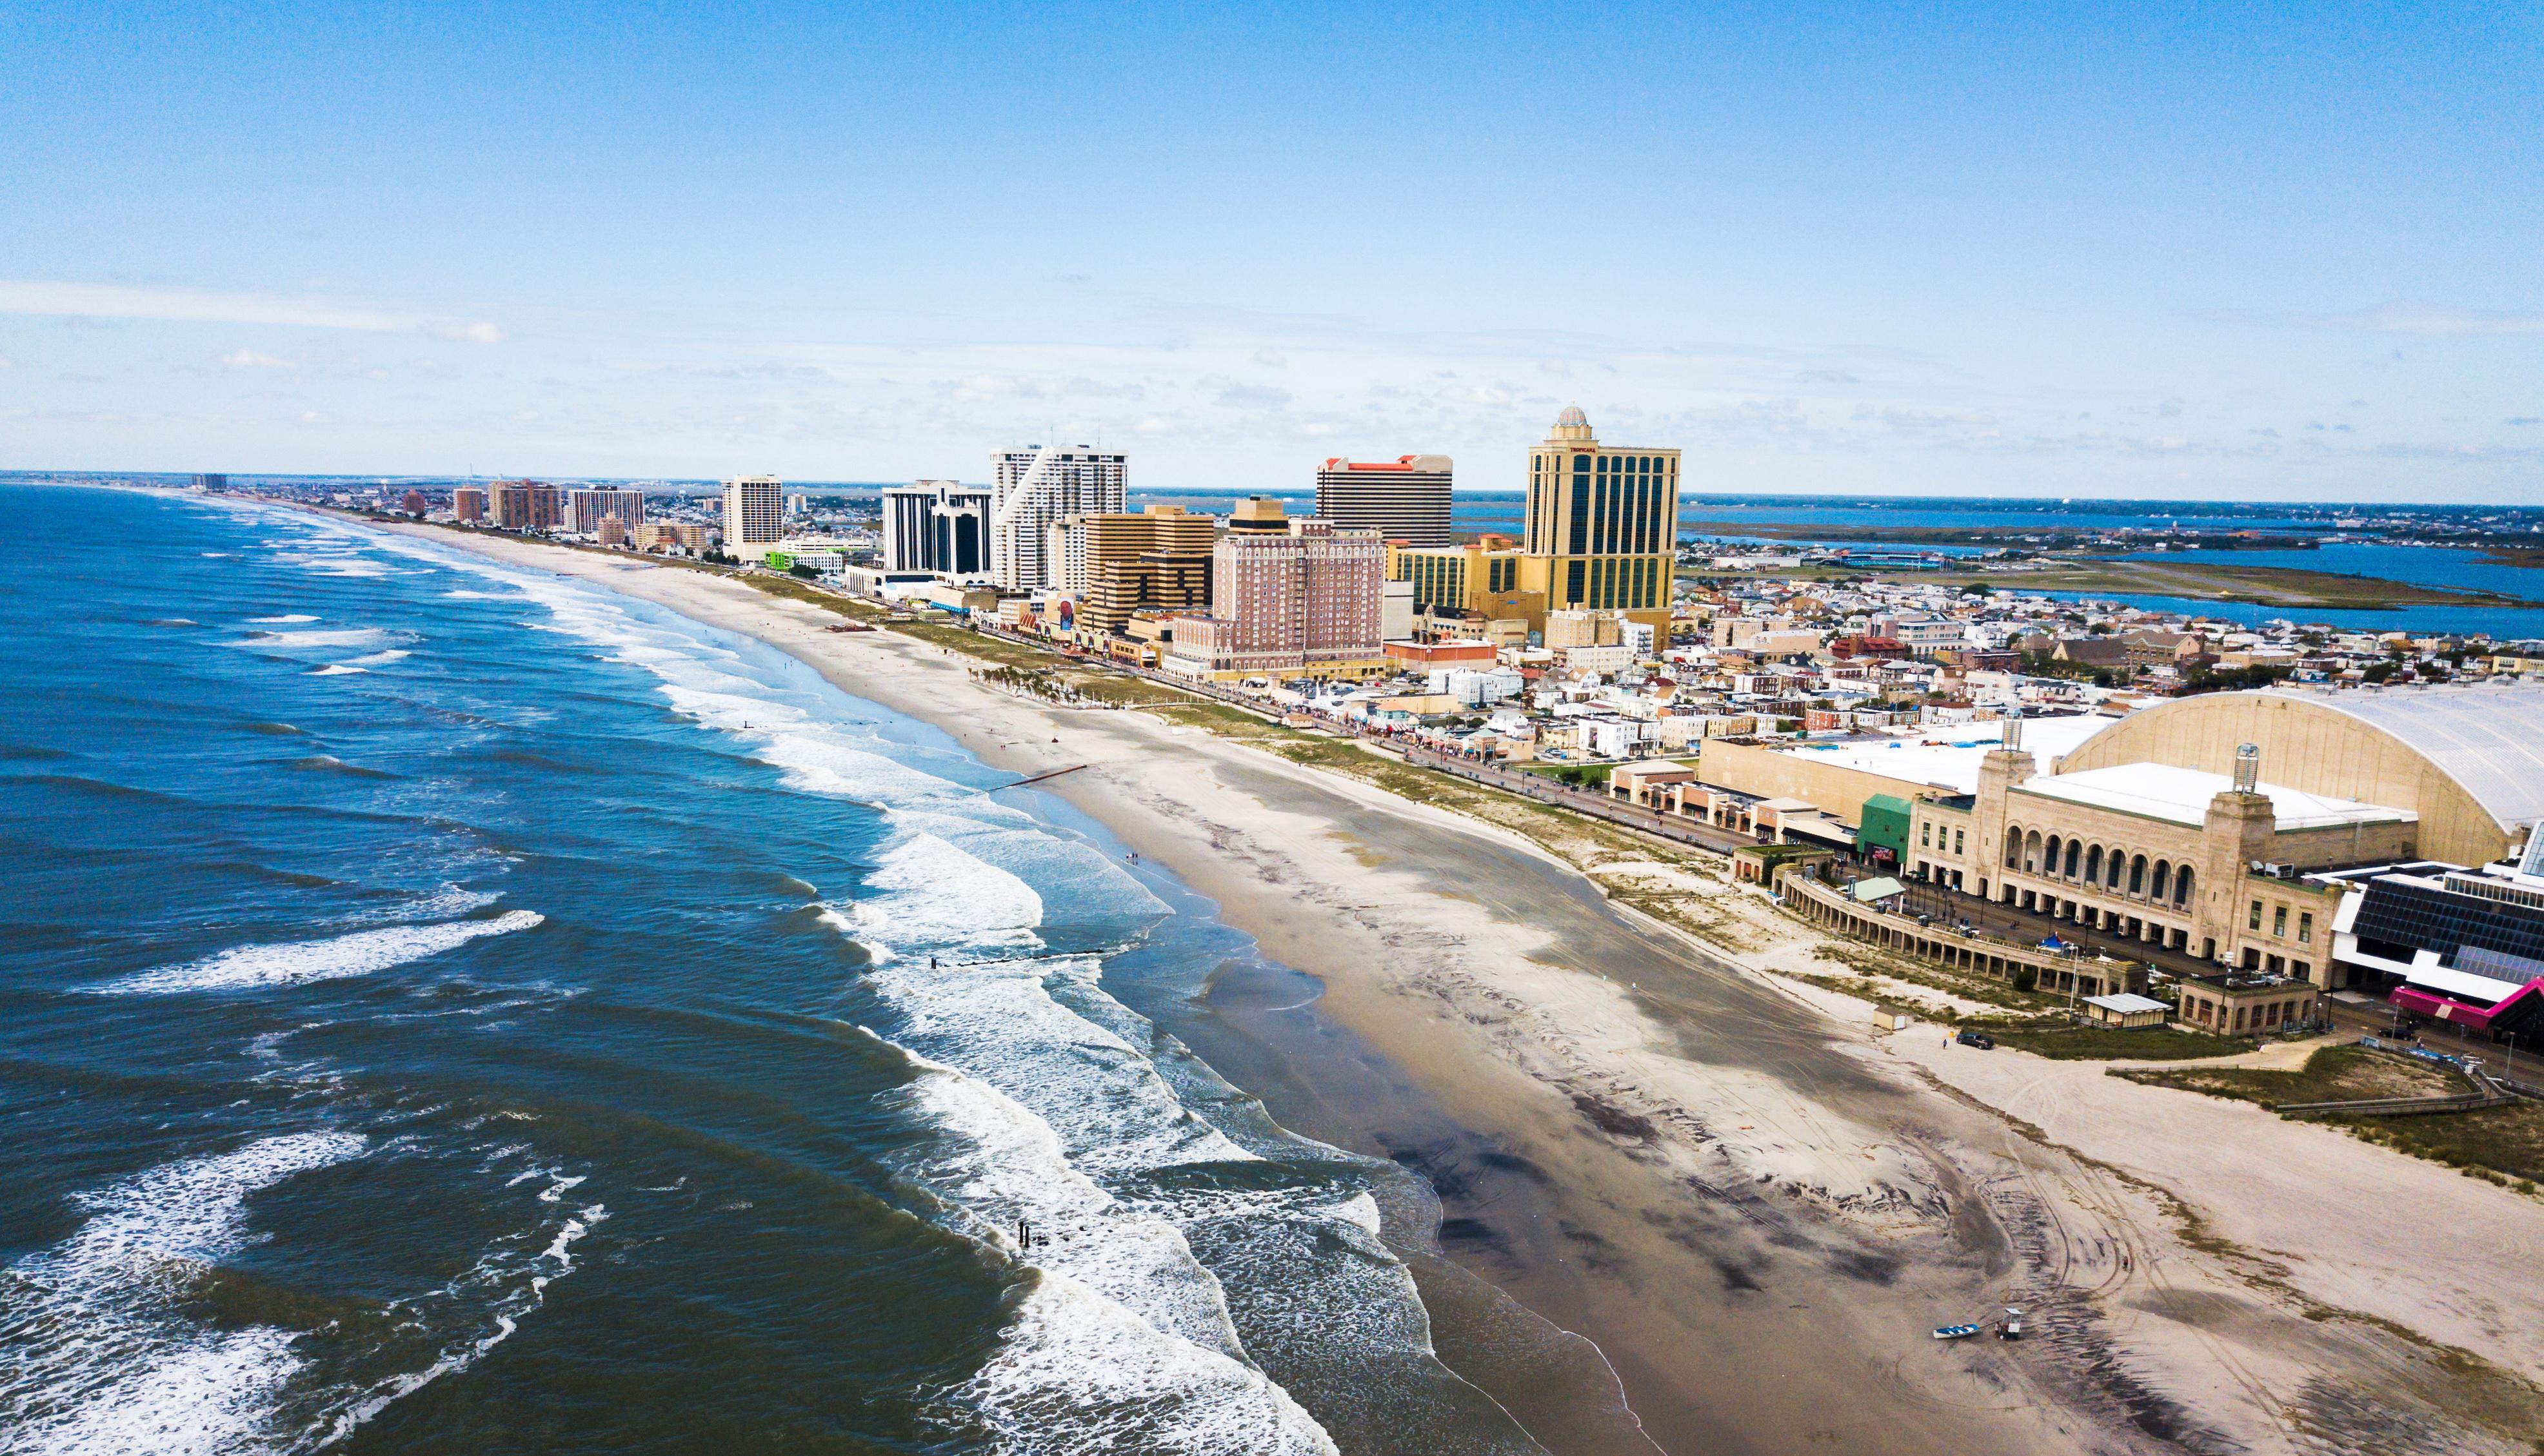 hotels in atlantic city find cheap atlantic city hotels with momondo rh momondo com